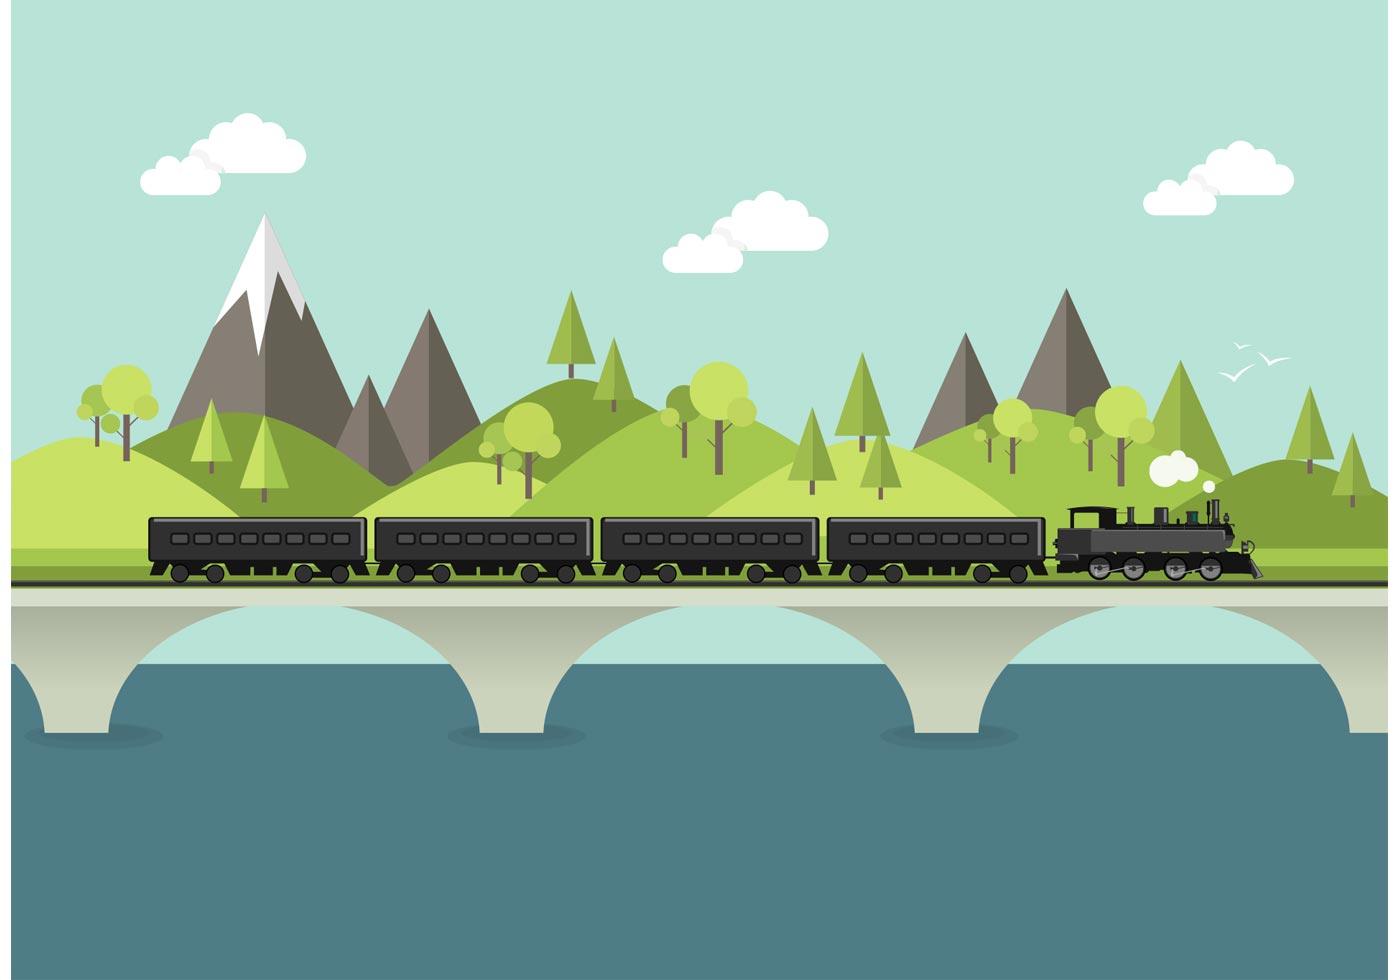 Landscape Illustration Vector Free: Steam Train In Landscape Vector